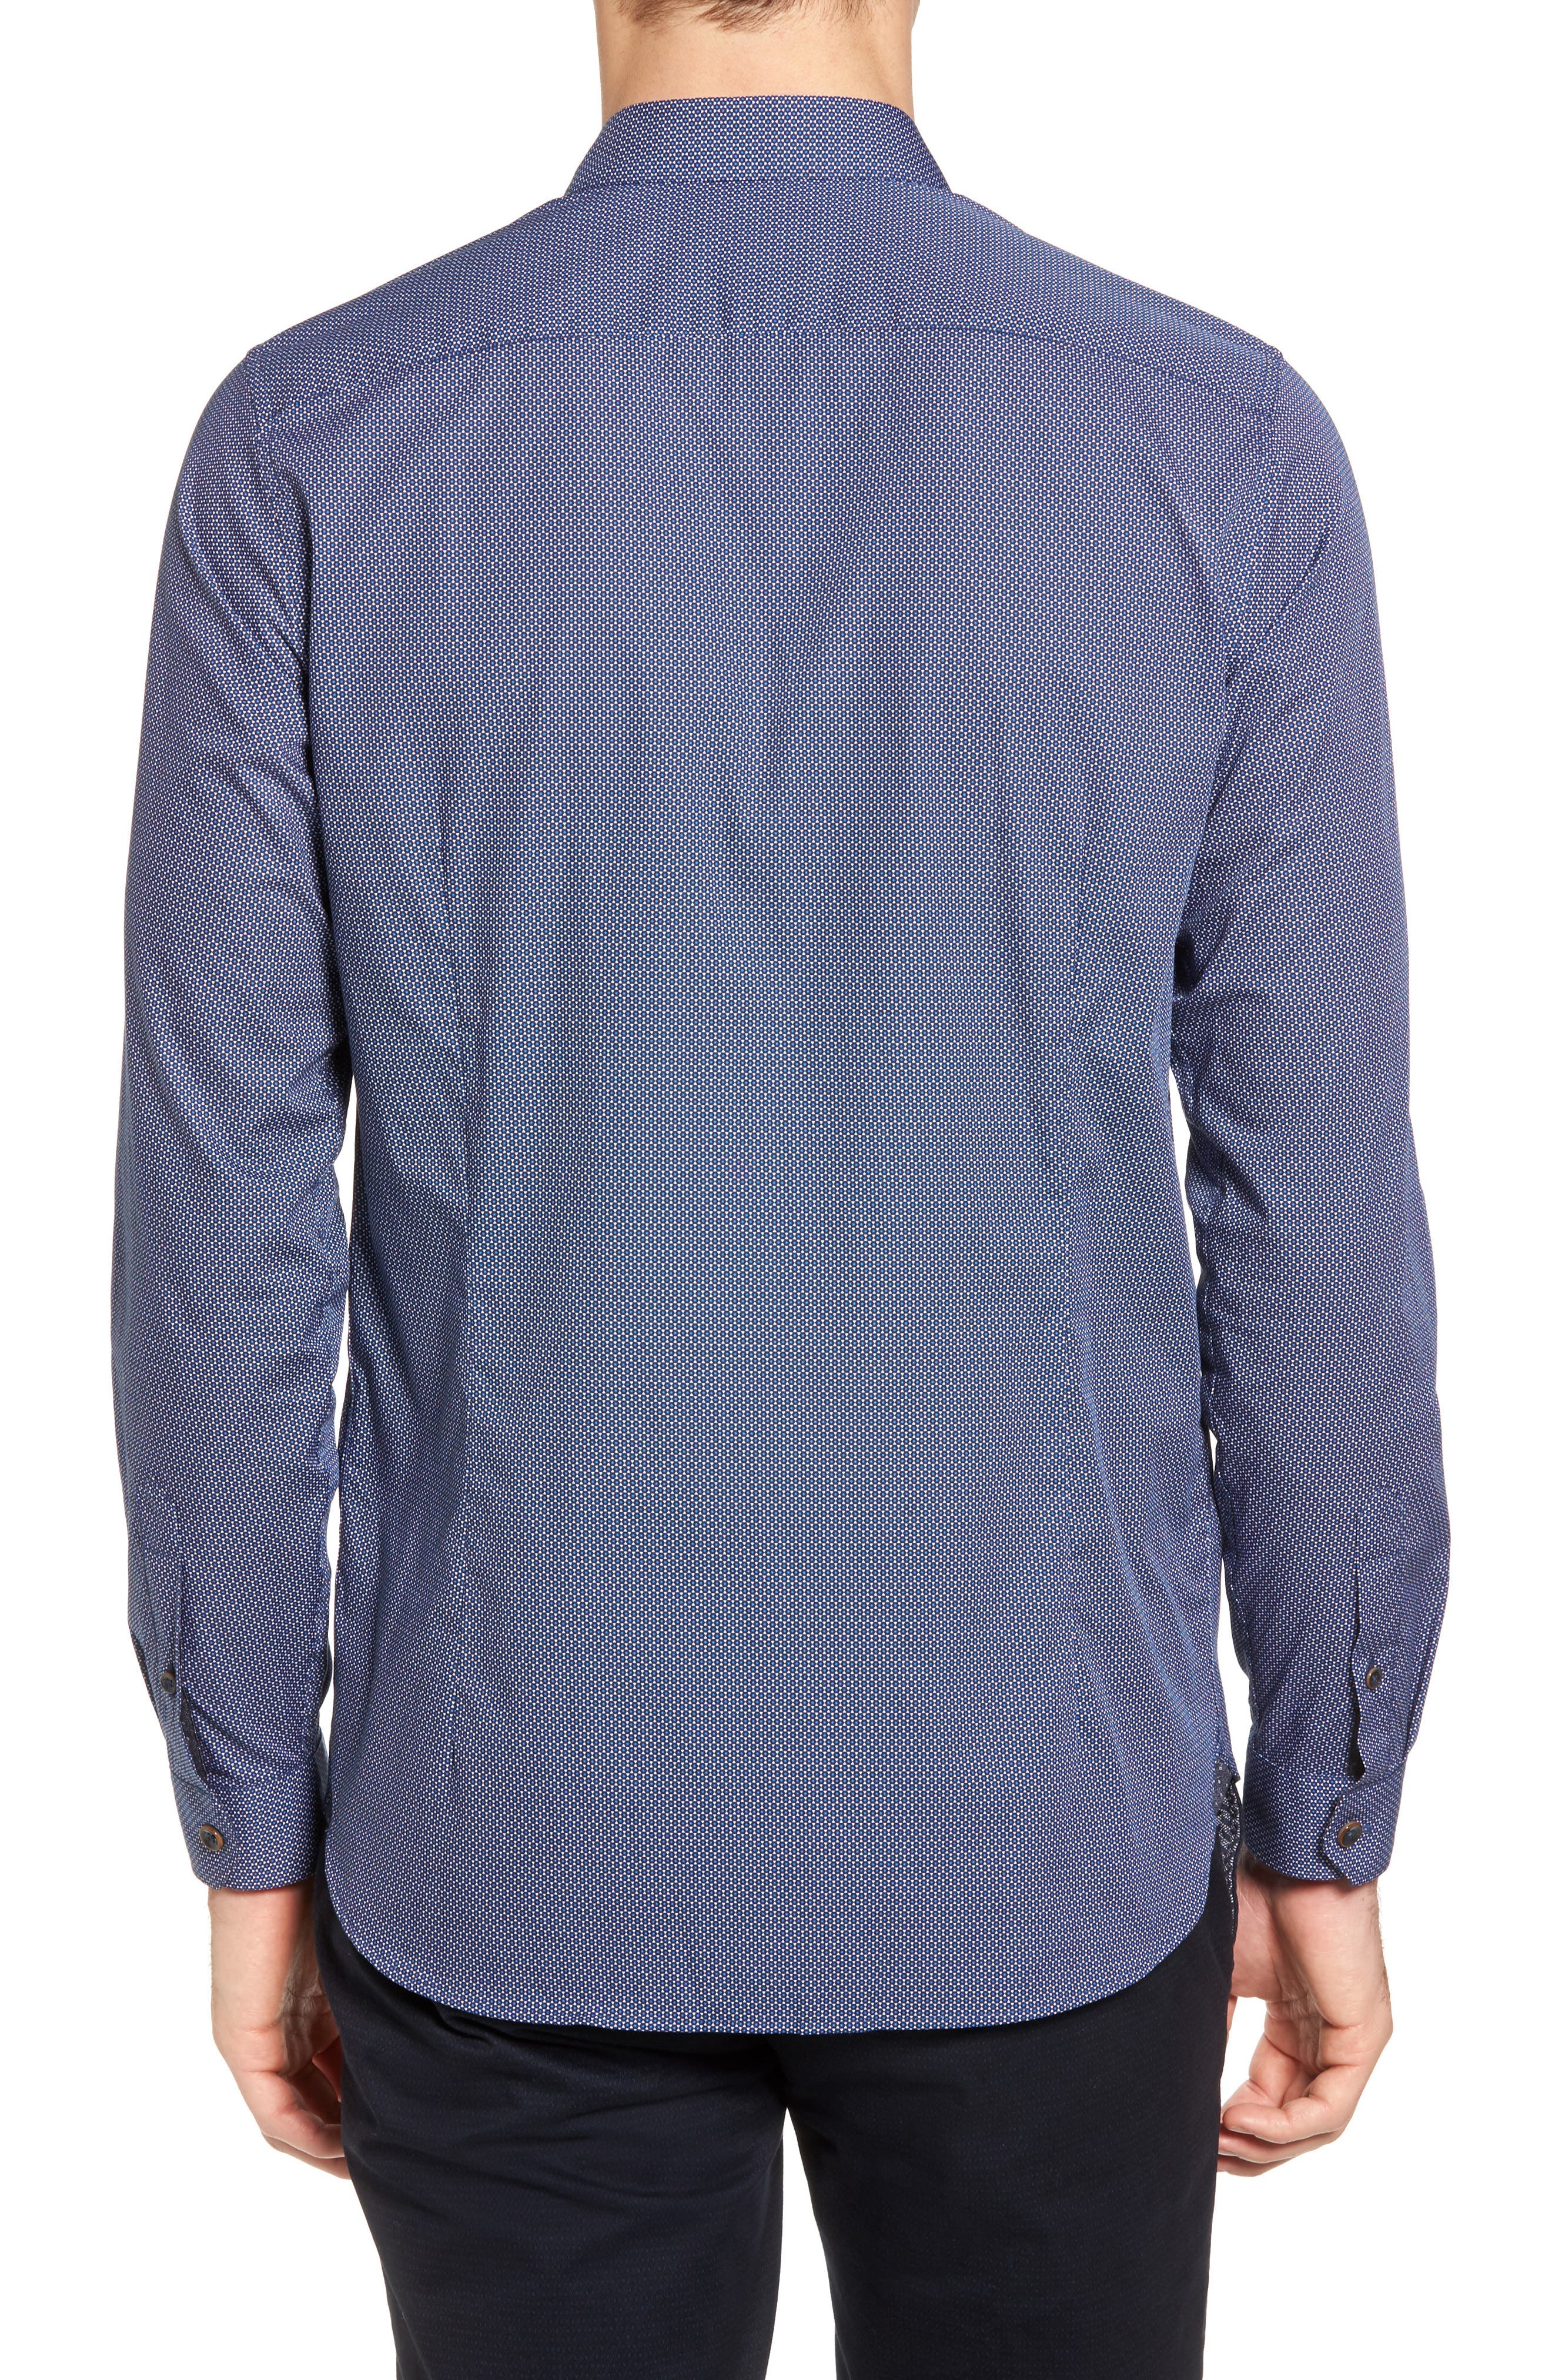 Merigeo Print Sport Shirt,                             Alternate thumbnail 2, color,                             410